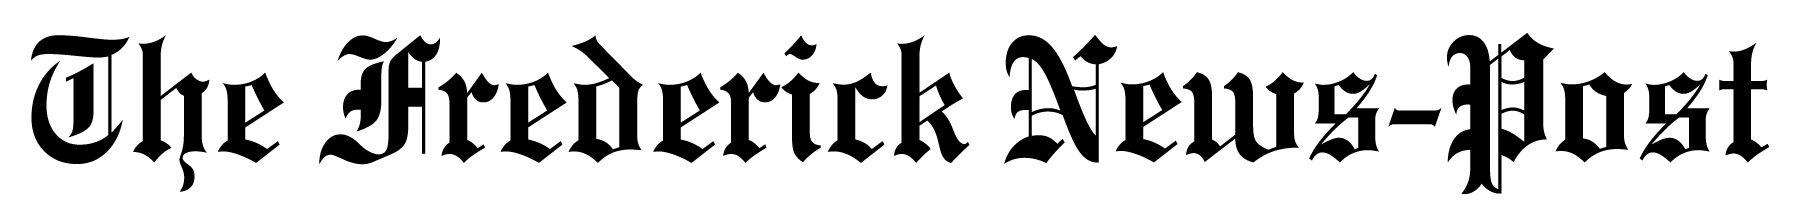 frederick news post.jpg